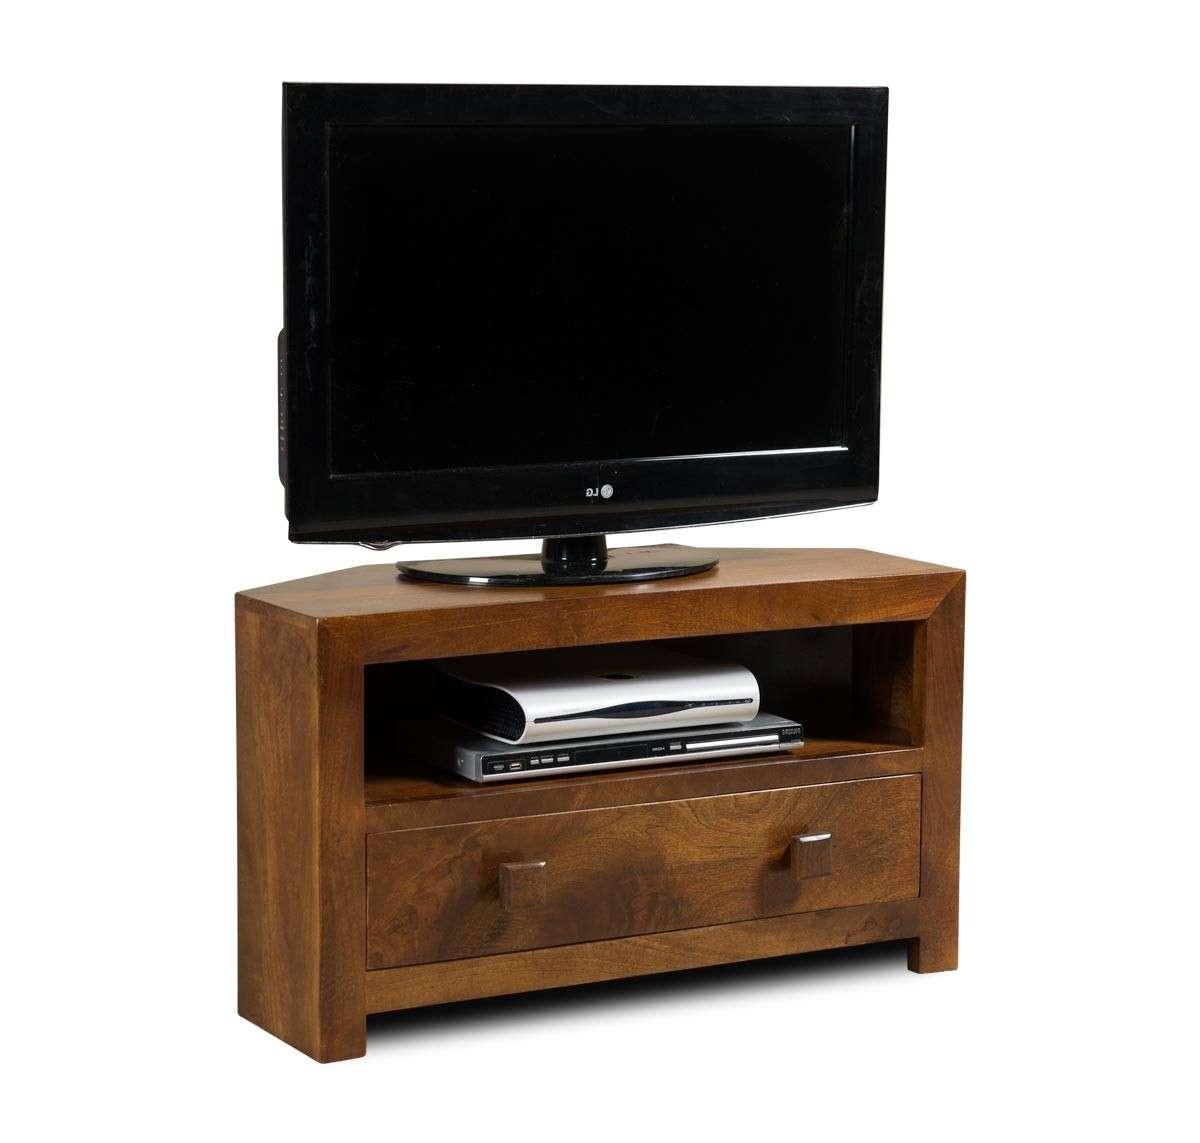 Dakota Mango Small Corner Tv Stand | Casa Bella Furniture Uk With Small Corner Tv Cabinets (View 5 of 20)